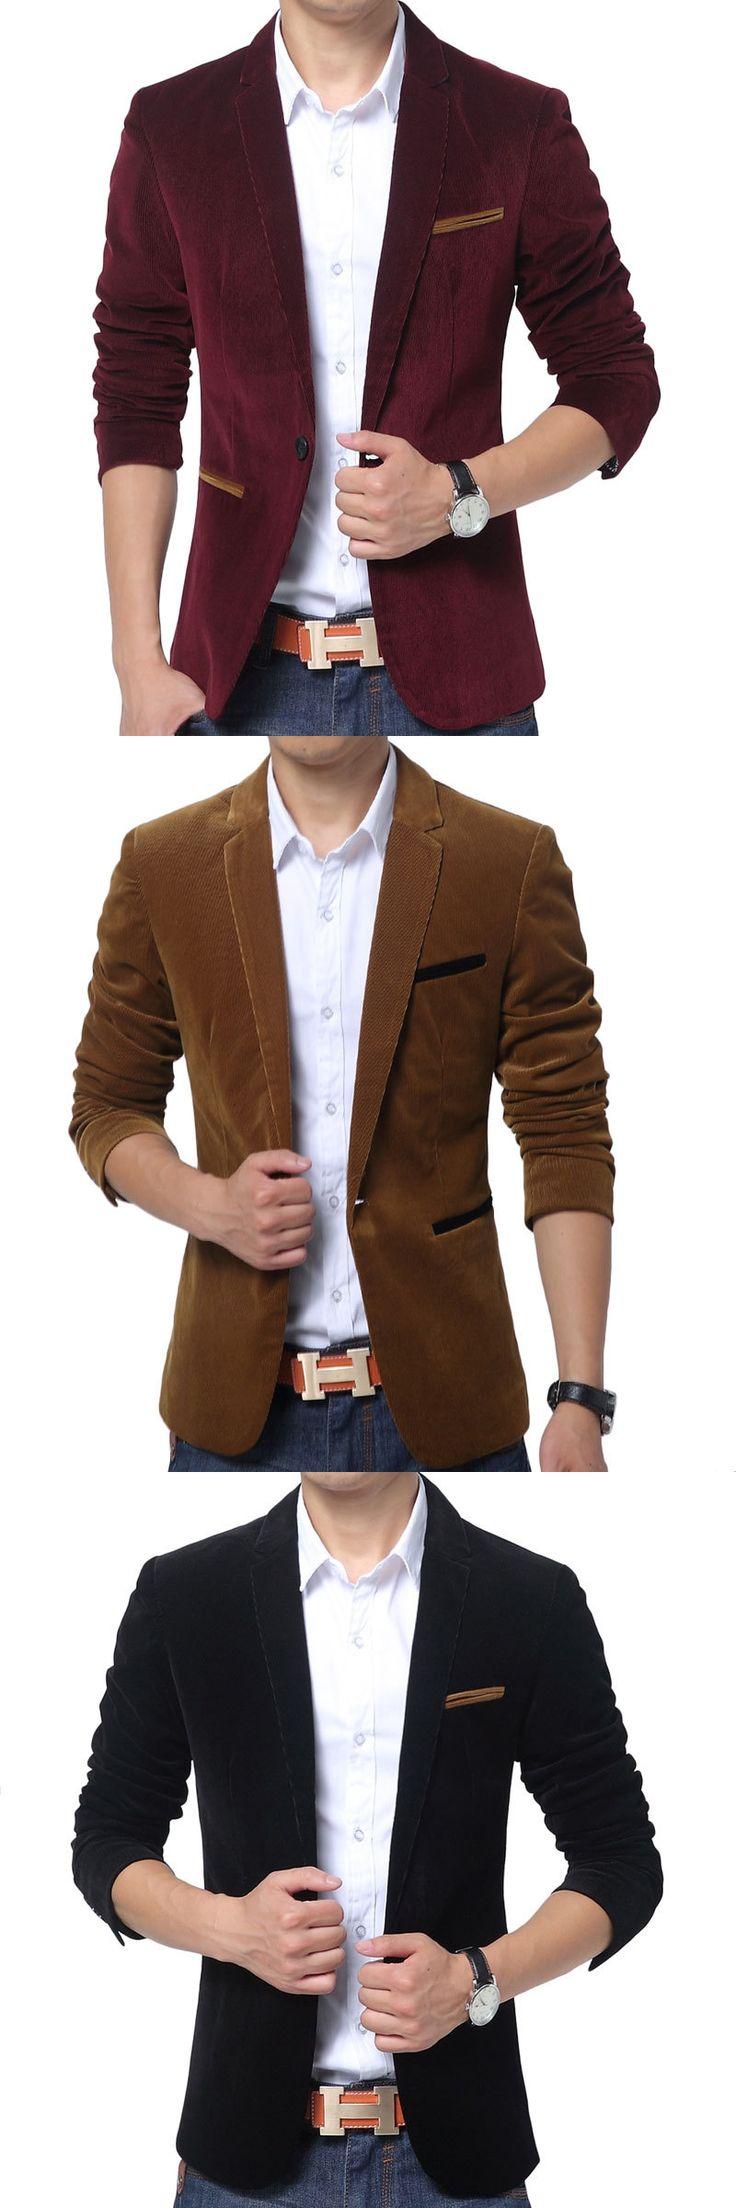 New Red Blazer Men 2017 Autumn Winter Fashion Mens Slim Fit Blazer Jacket Casual Brand Single Button Wedding Suit Jacket 3Xl